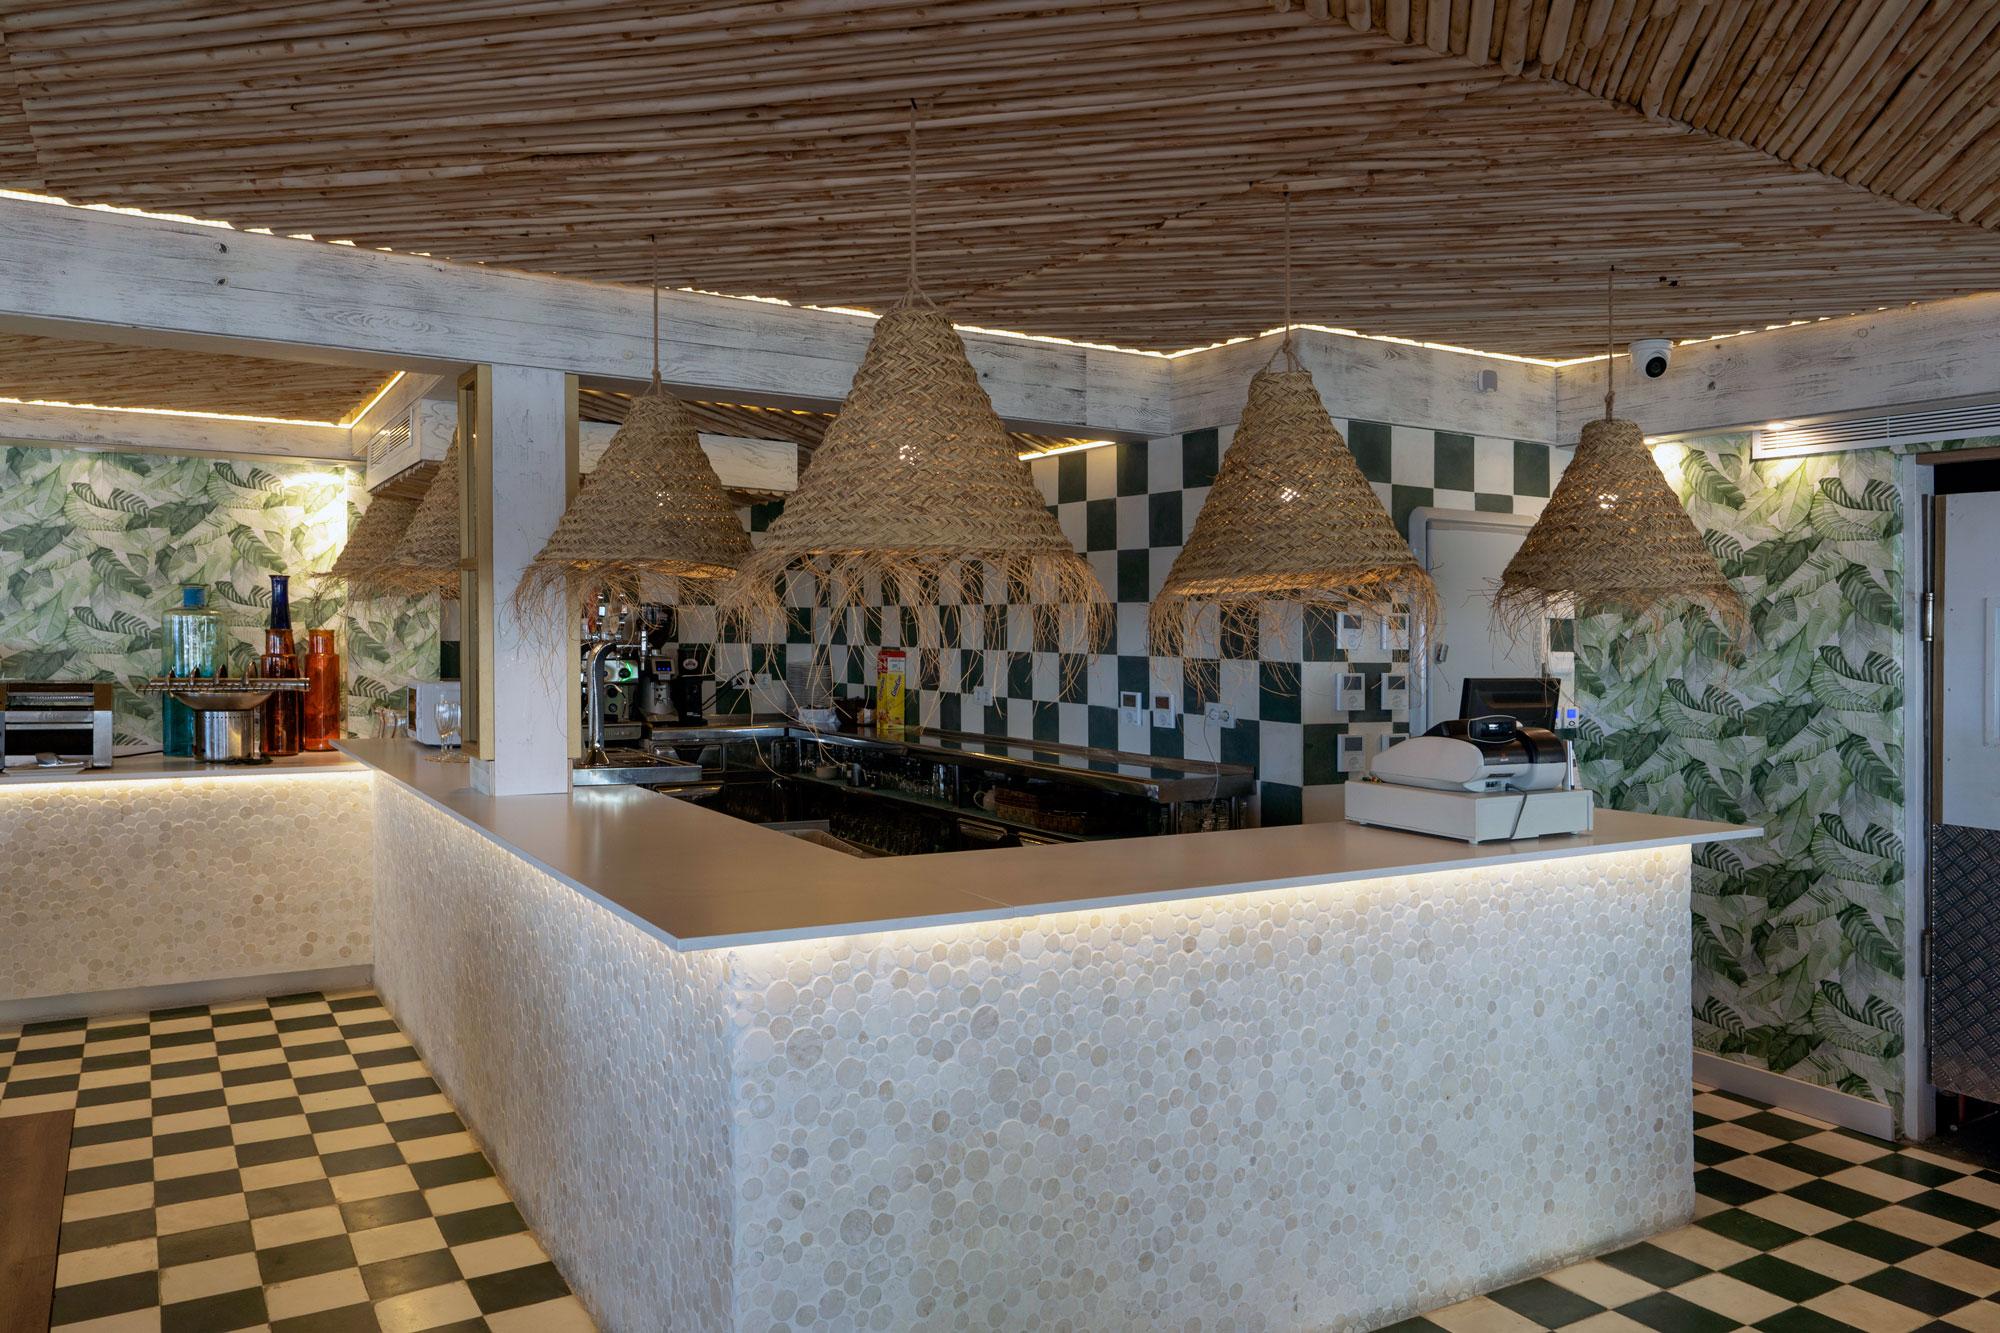 Hotel Mediterráneo  - Hotel Mediterraneo Park 14 Dekton Silestone Piedra Natural Cosentino 59